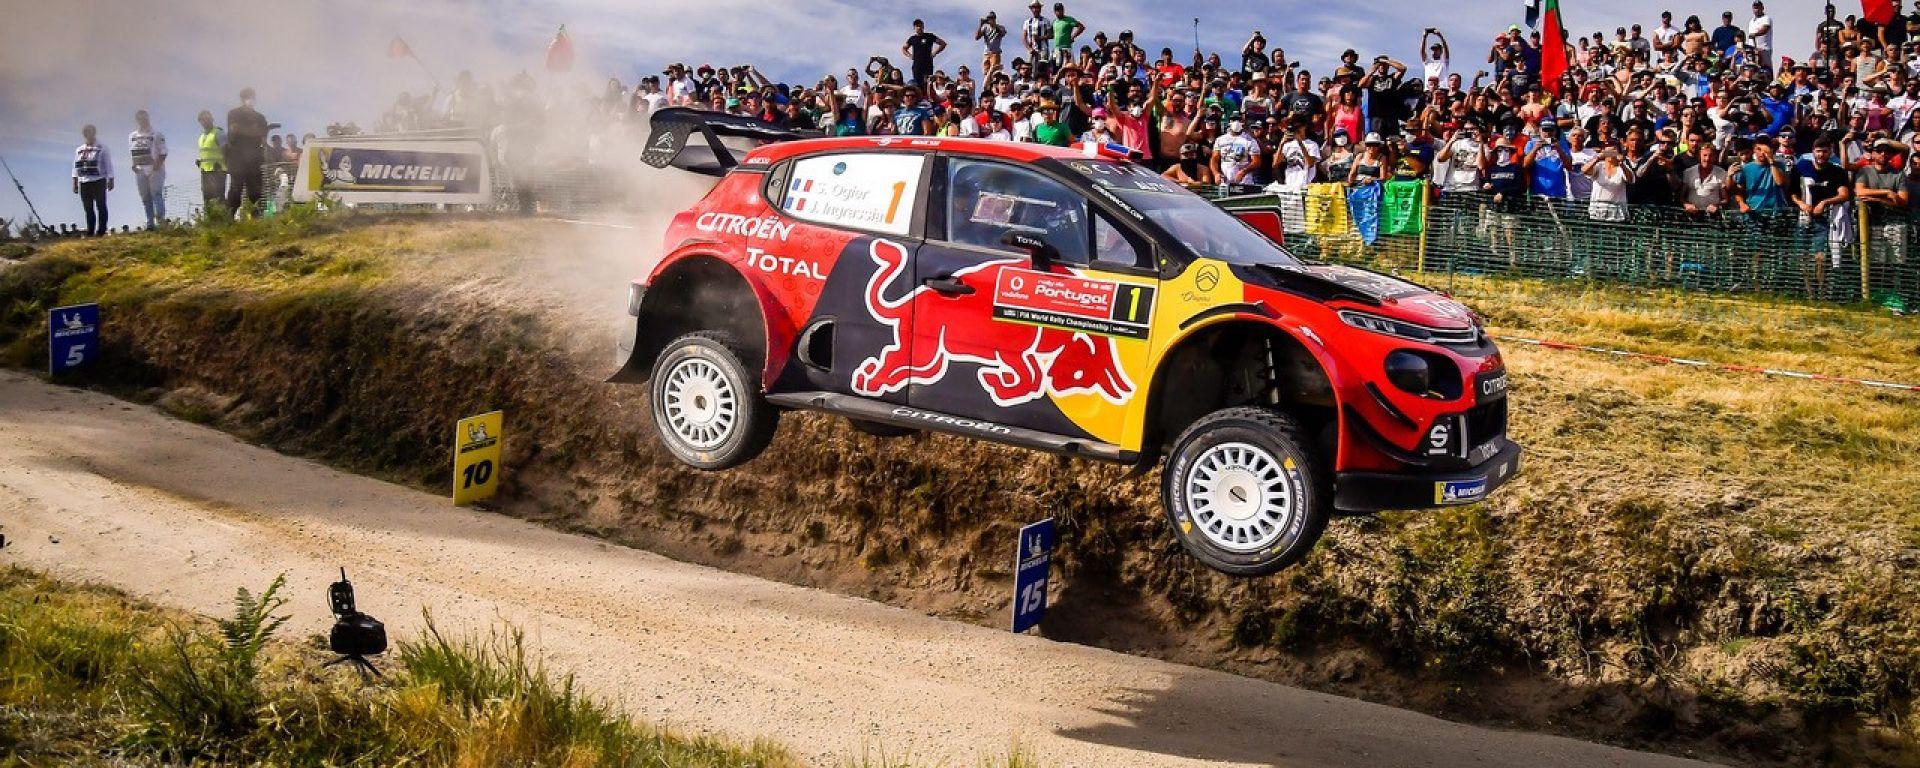 Sébastien Ogier - Citroen C3 Wrc Plus - Rally del Portogallo